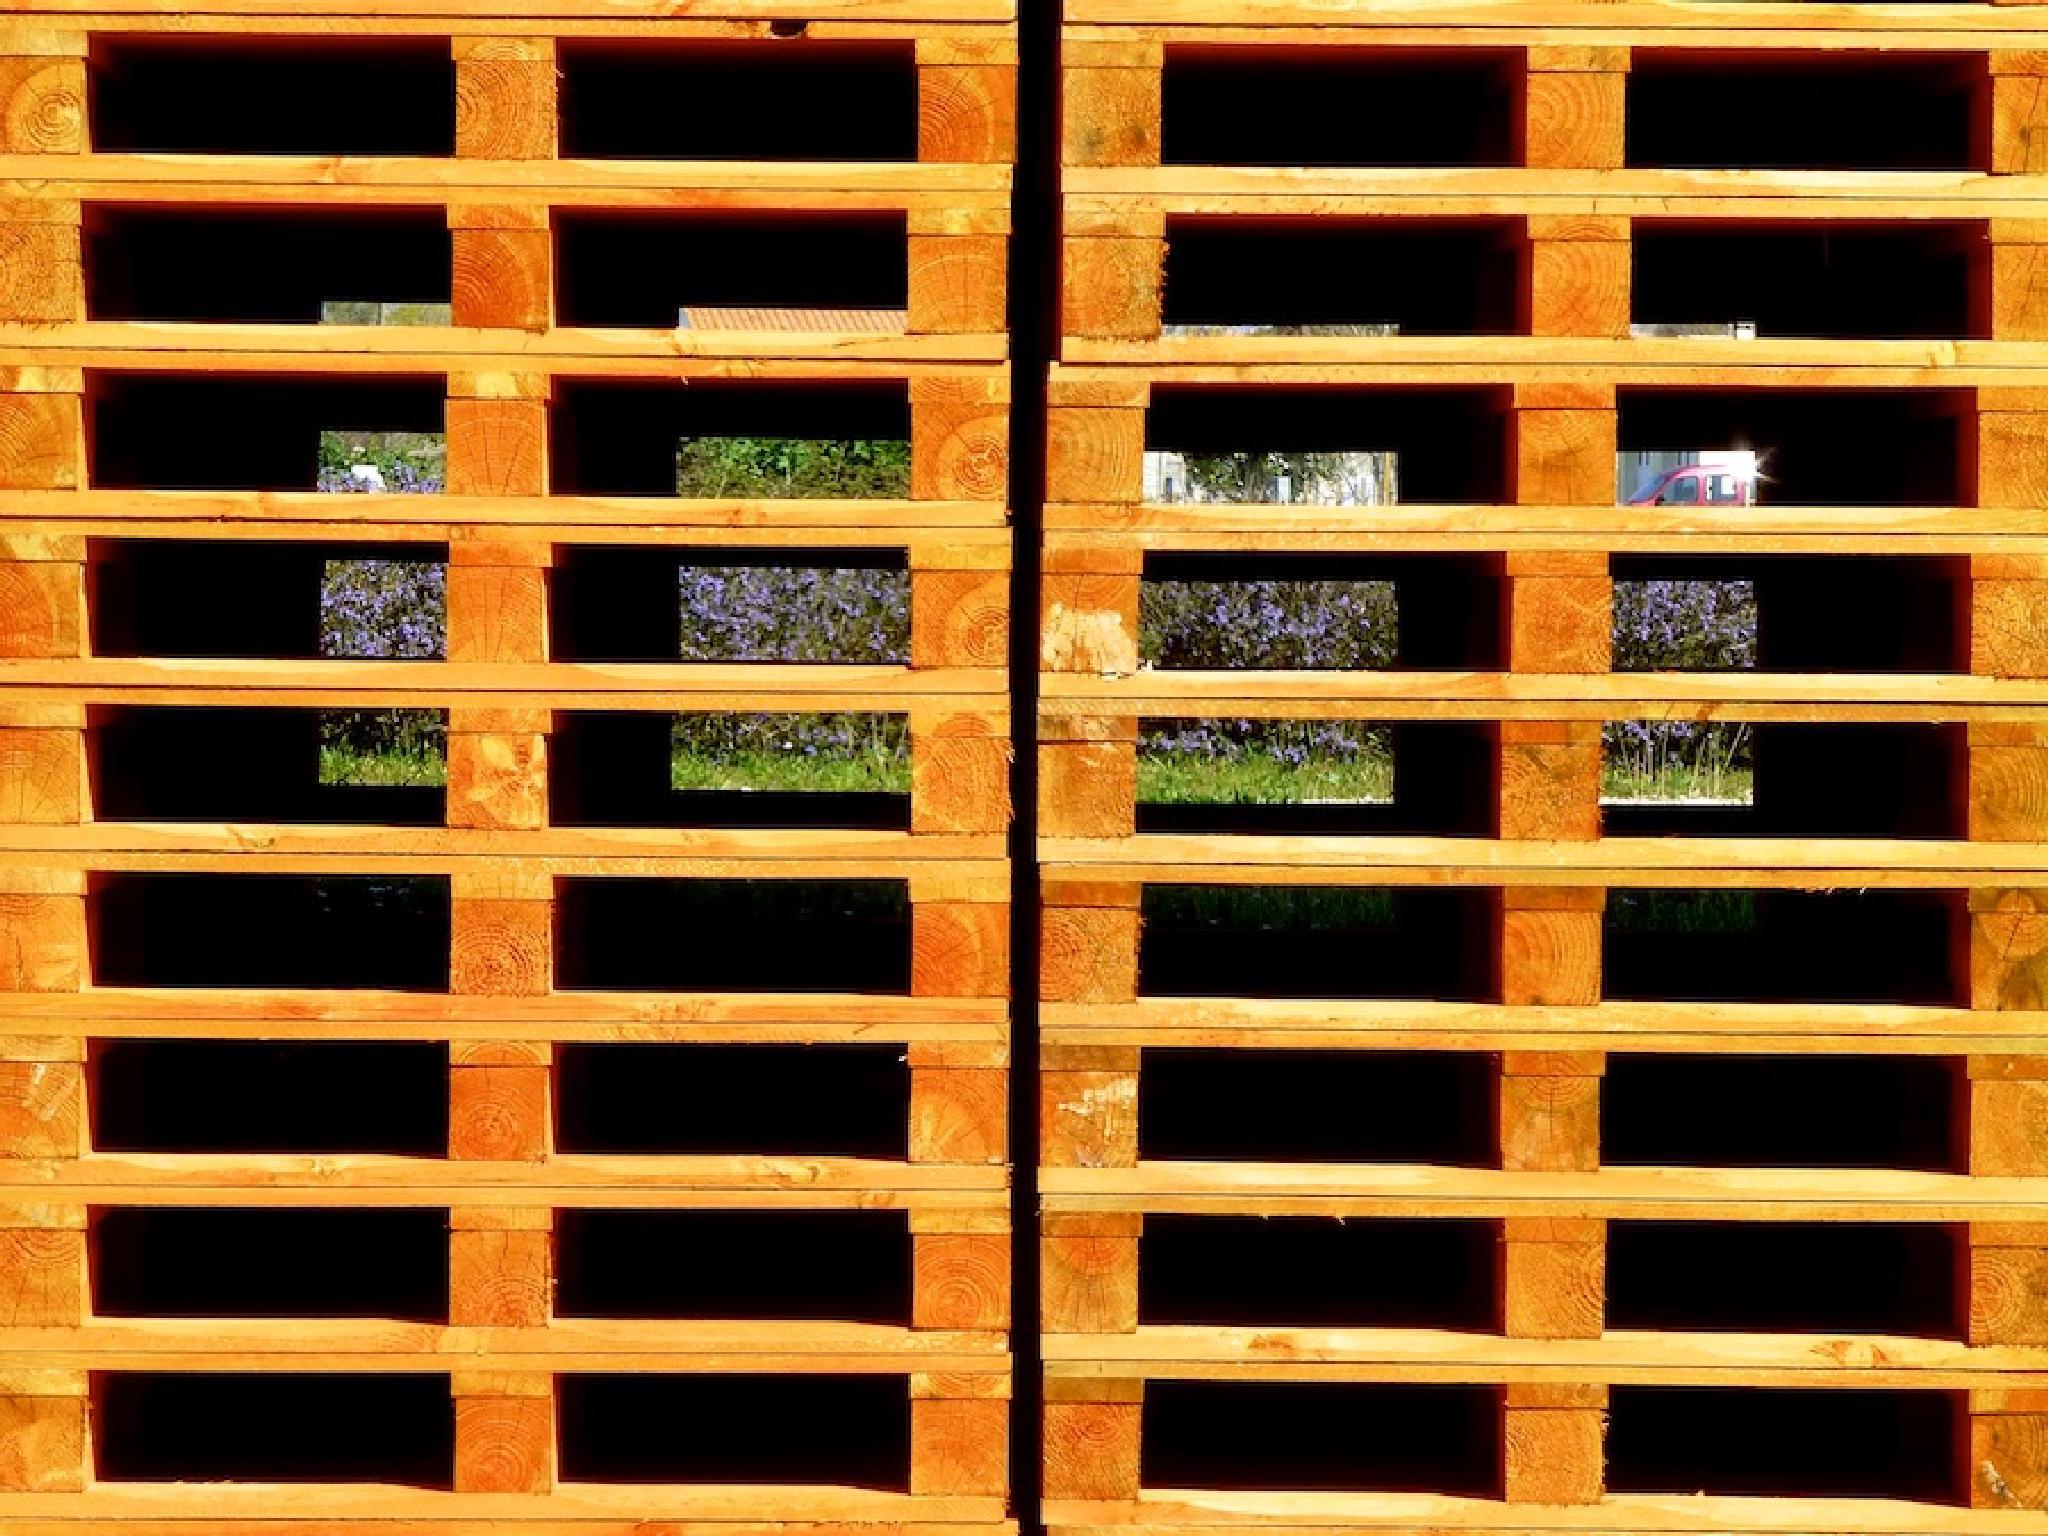 Pallet Storage by christian.nesler1